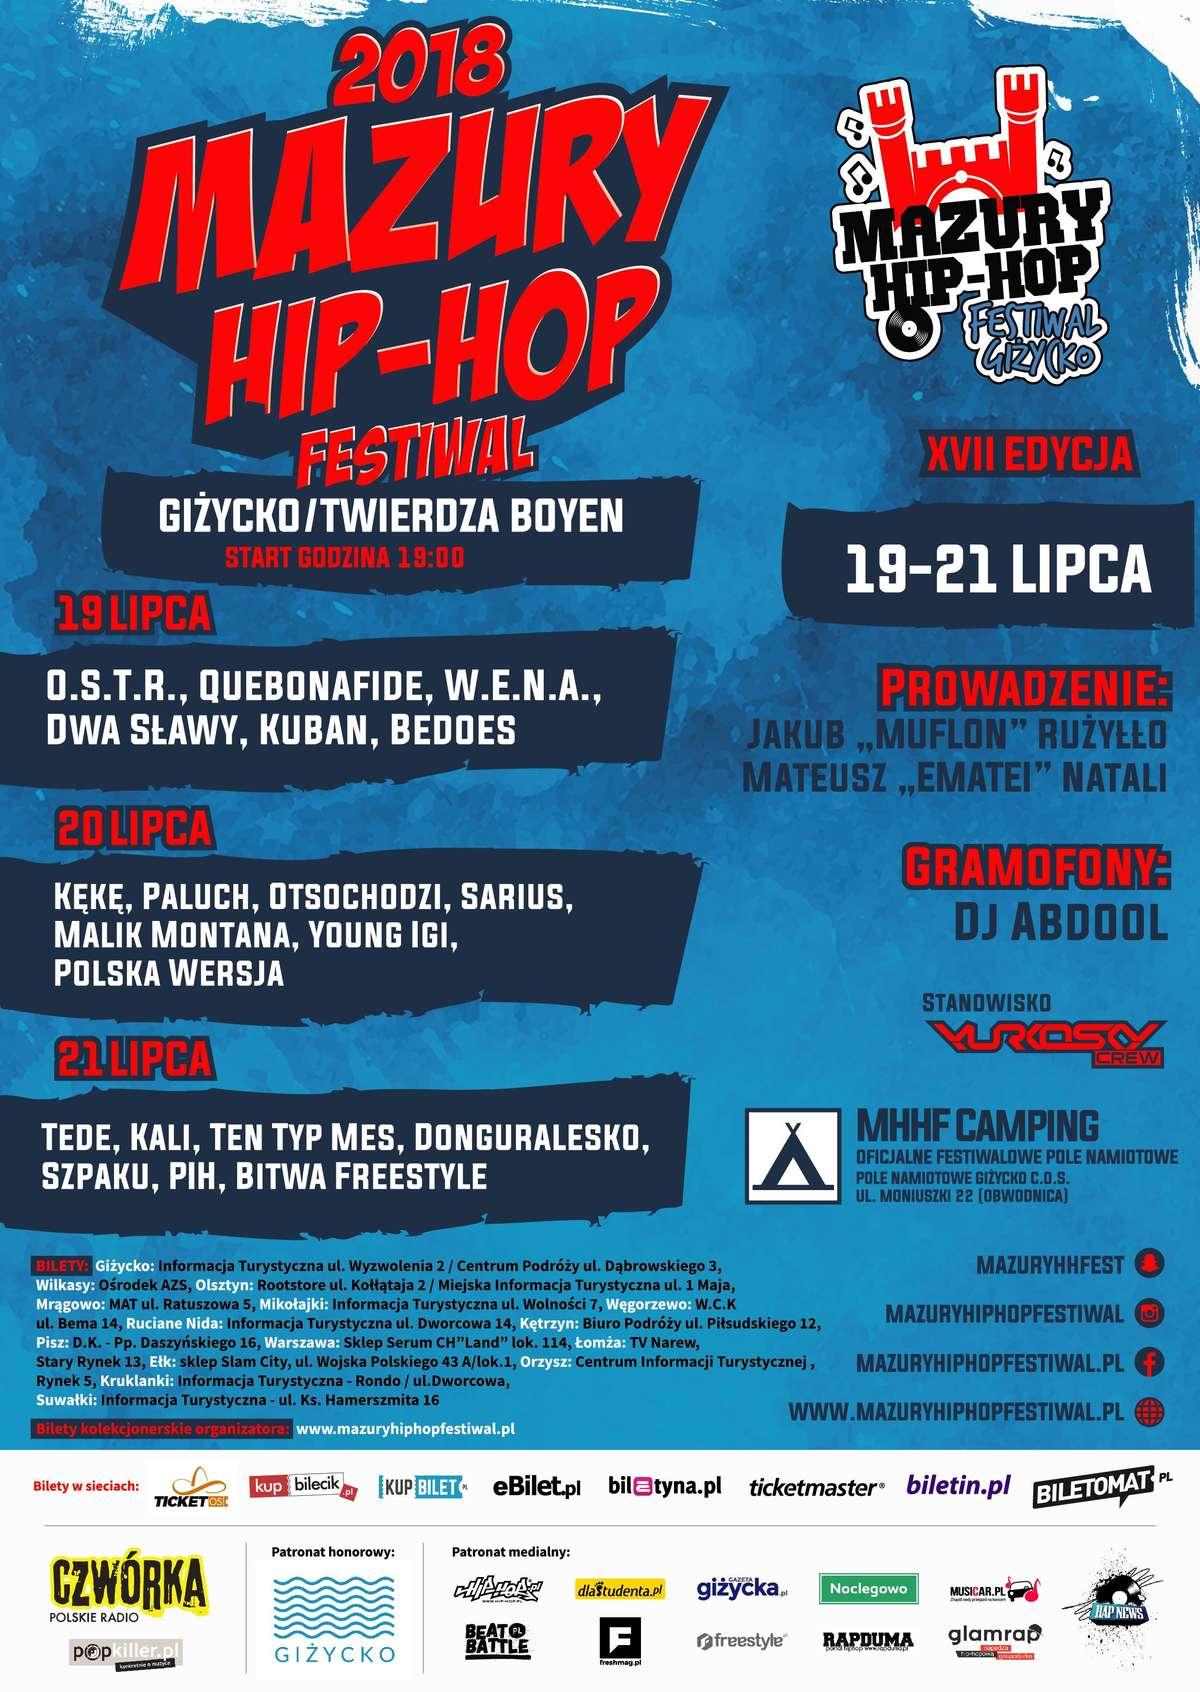 Mazury Hip-Hop Festiwal Giżycko 2018 - 19-21 lipca  - full image